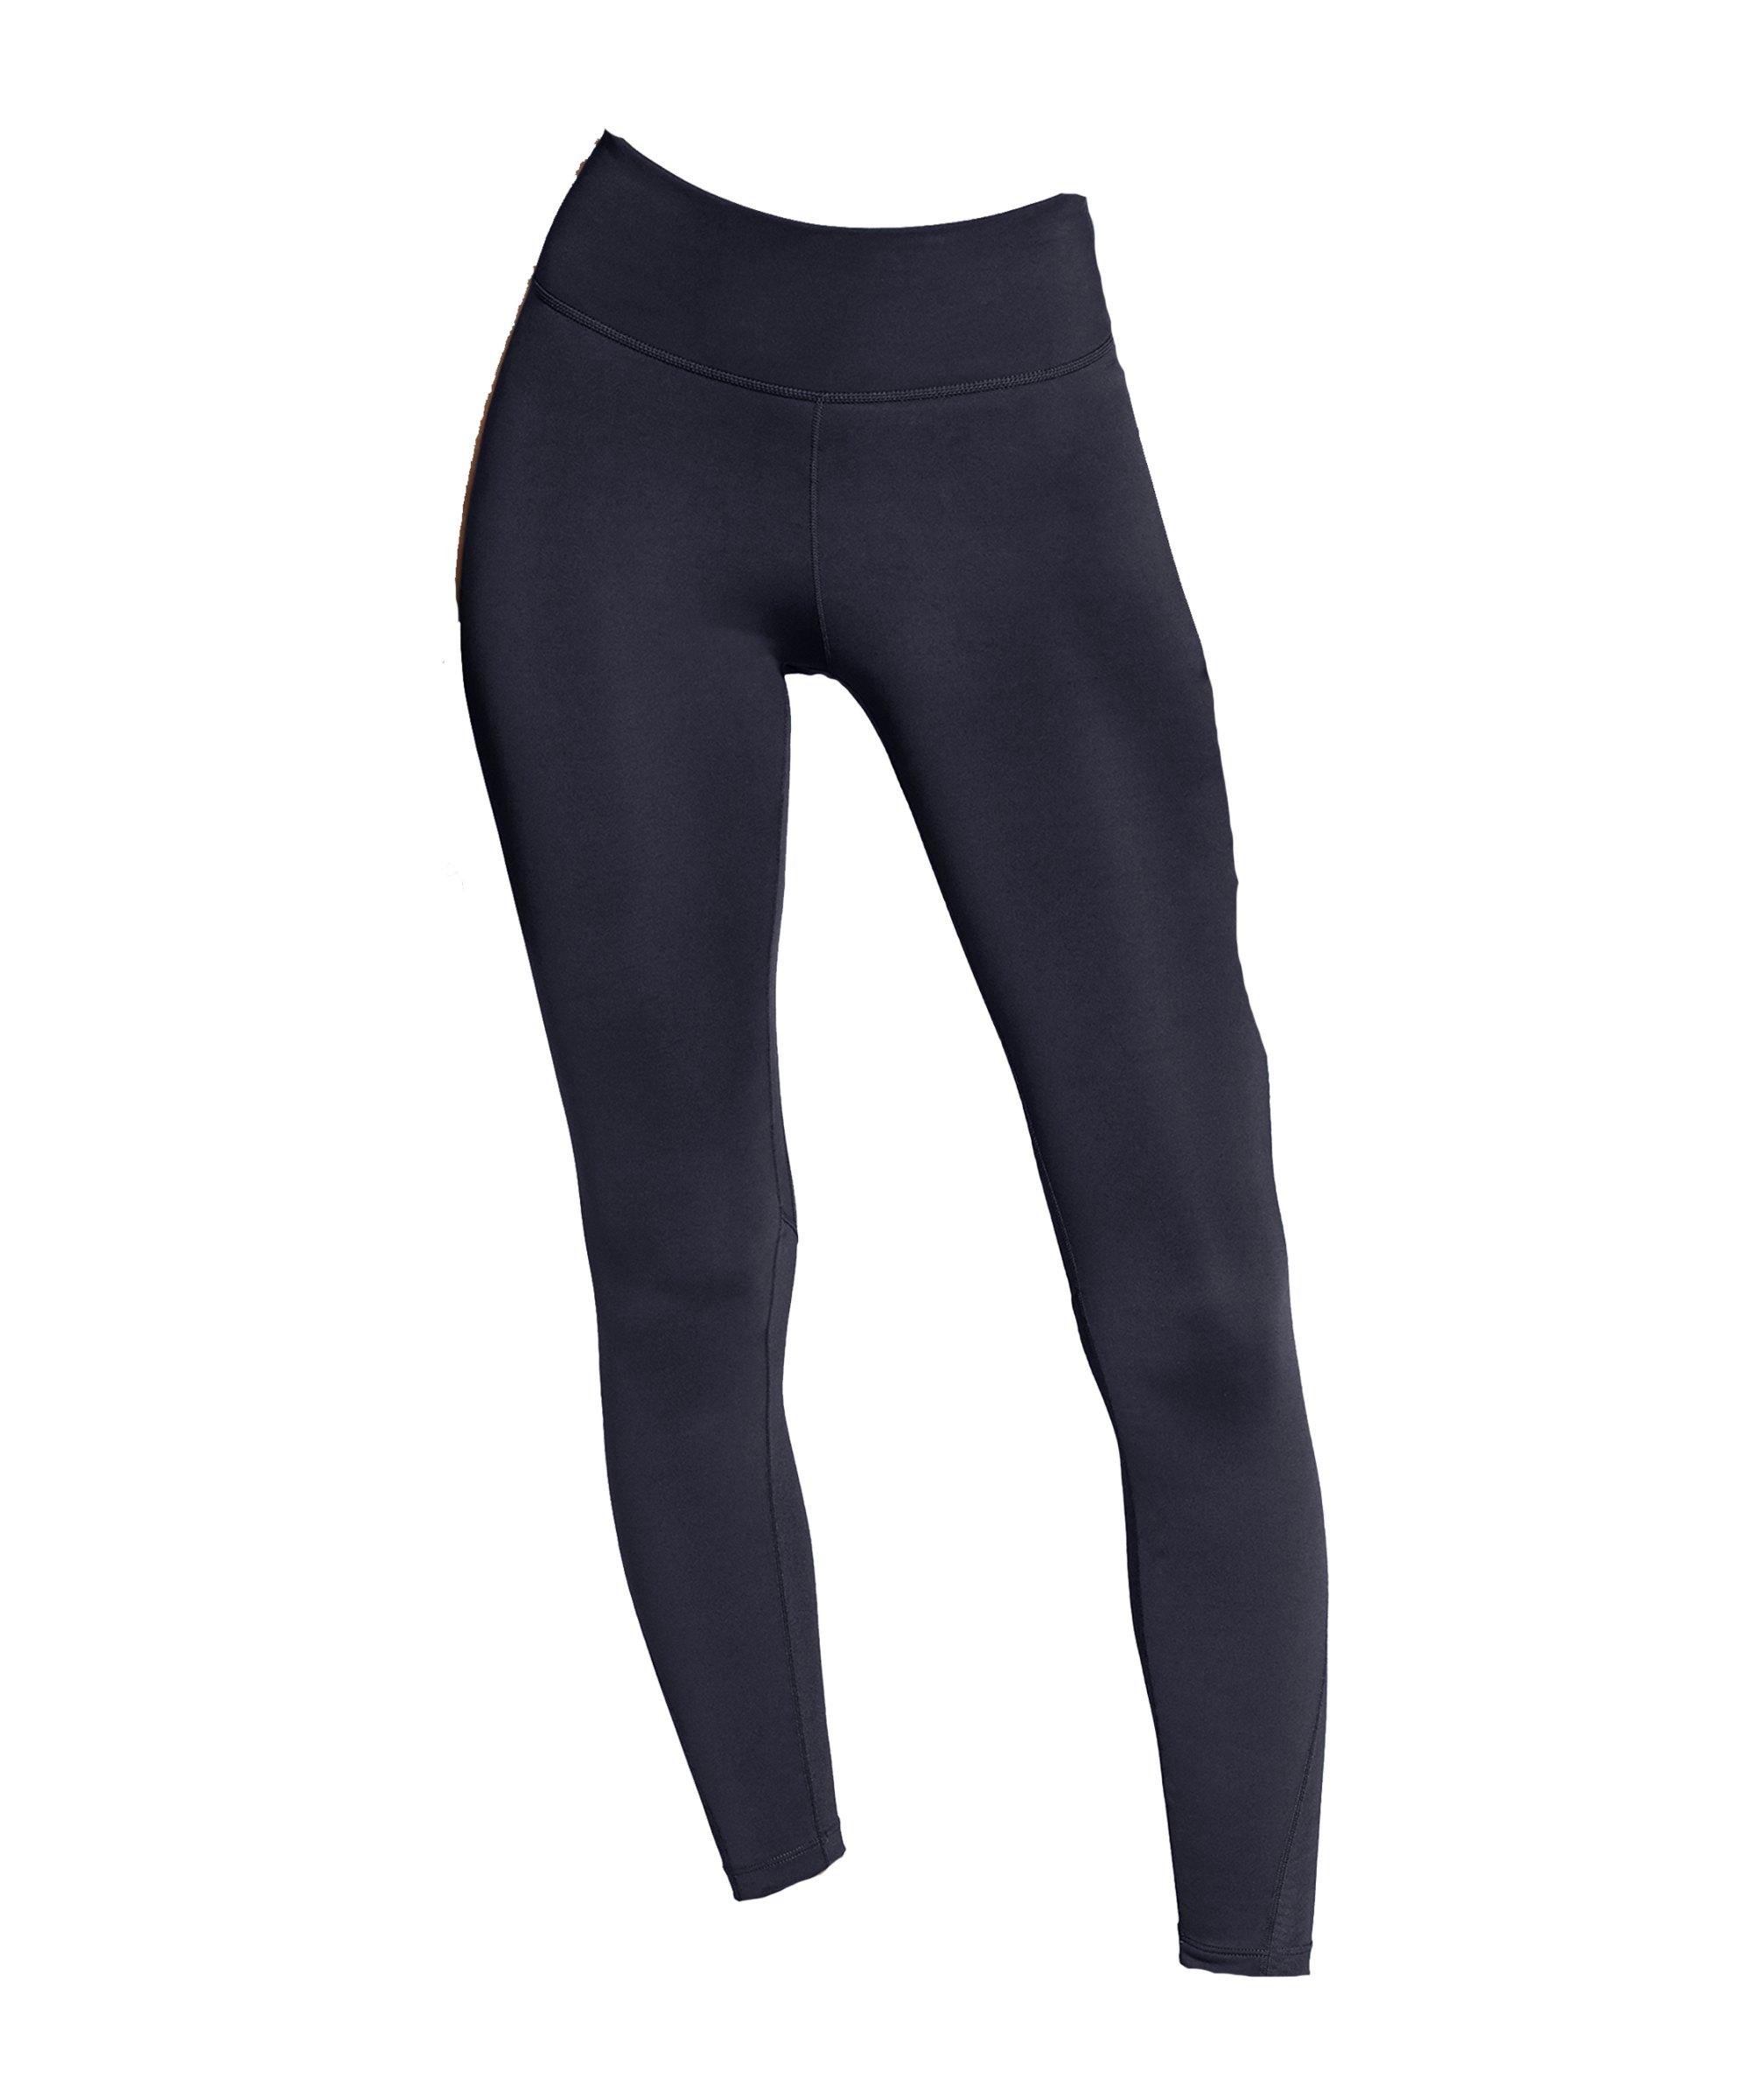 Nike One 7/8 Leggings Training Damen Blau F451 - blau